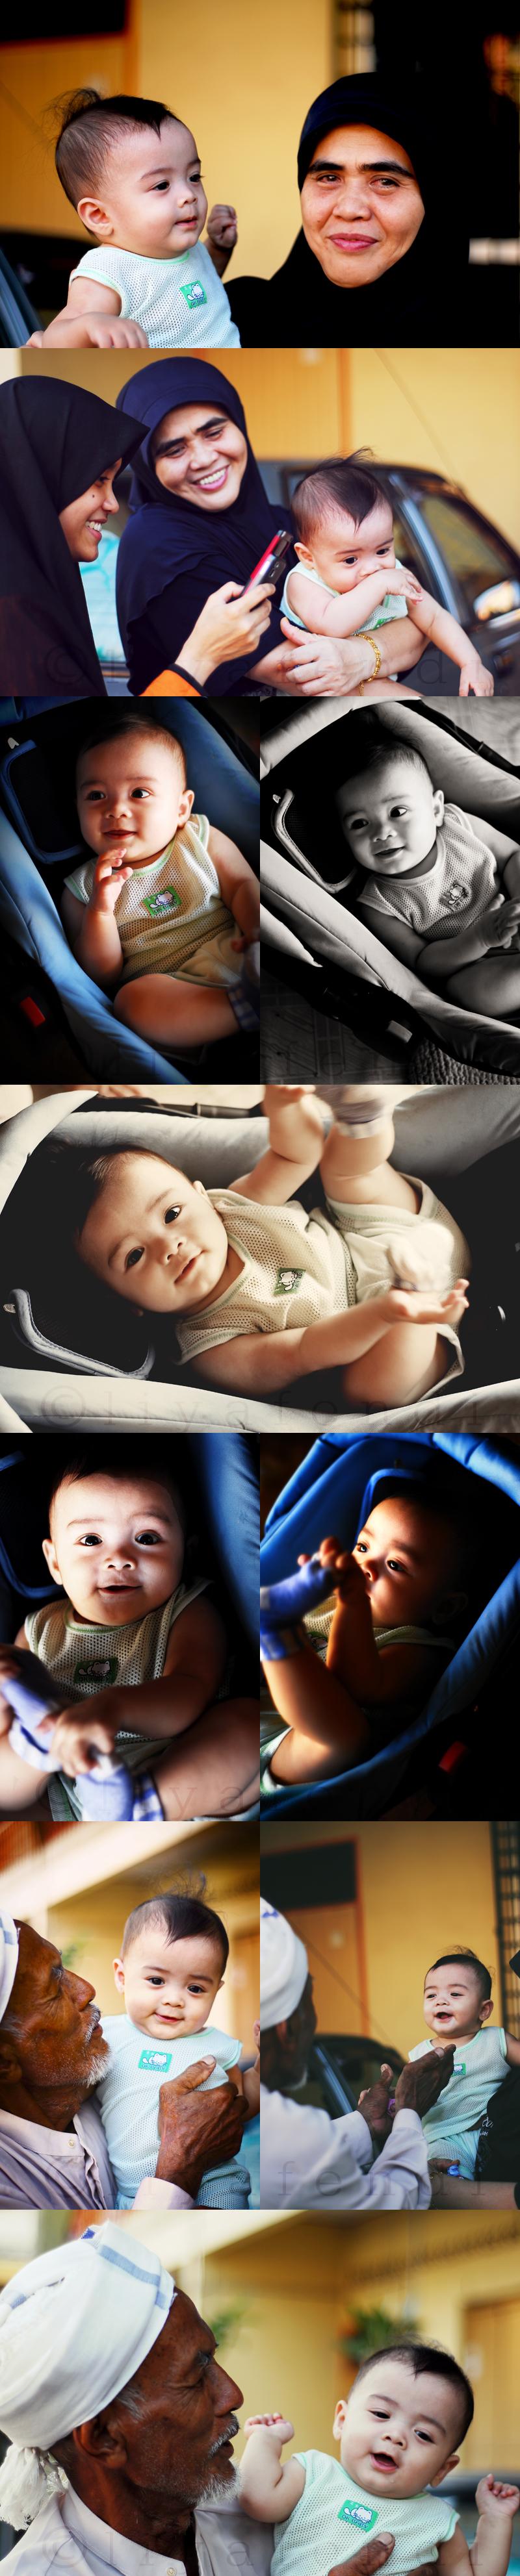 My nephew, Ihsan Fathi. 7 months